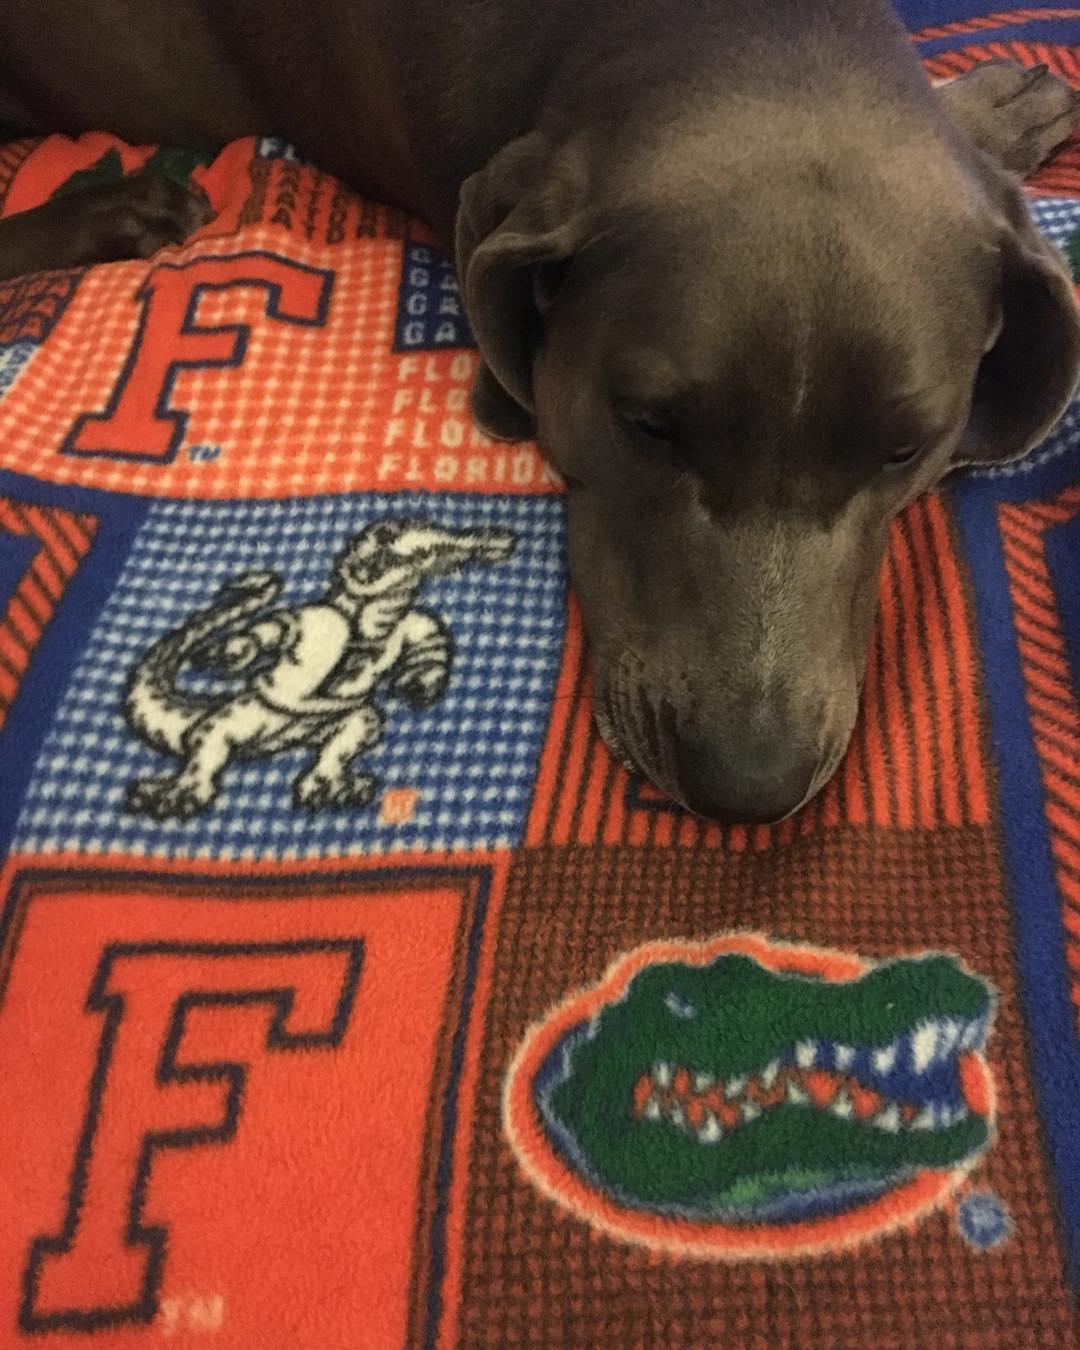 dog on Univ of Florida blanket